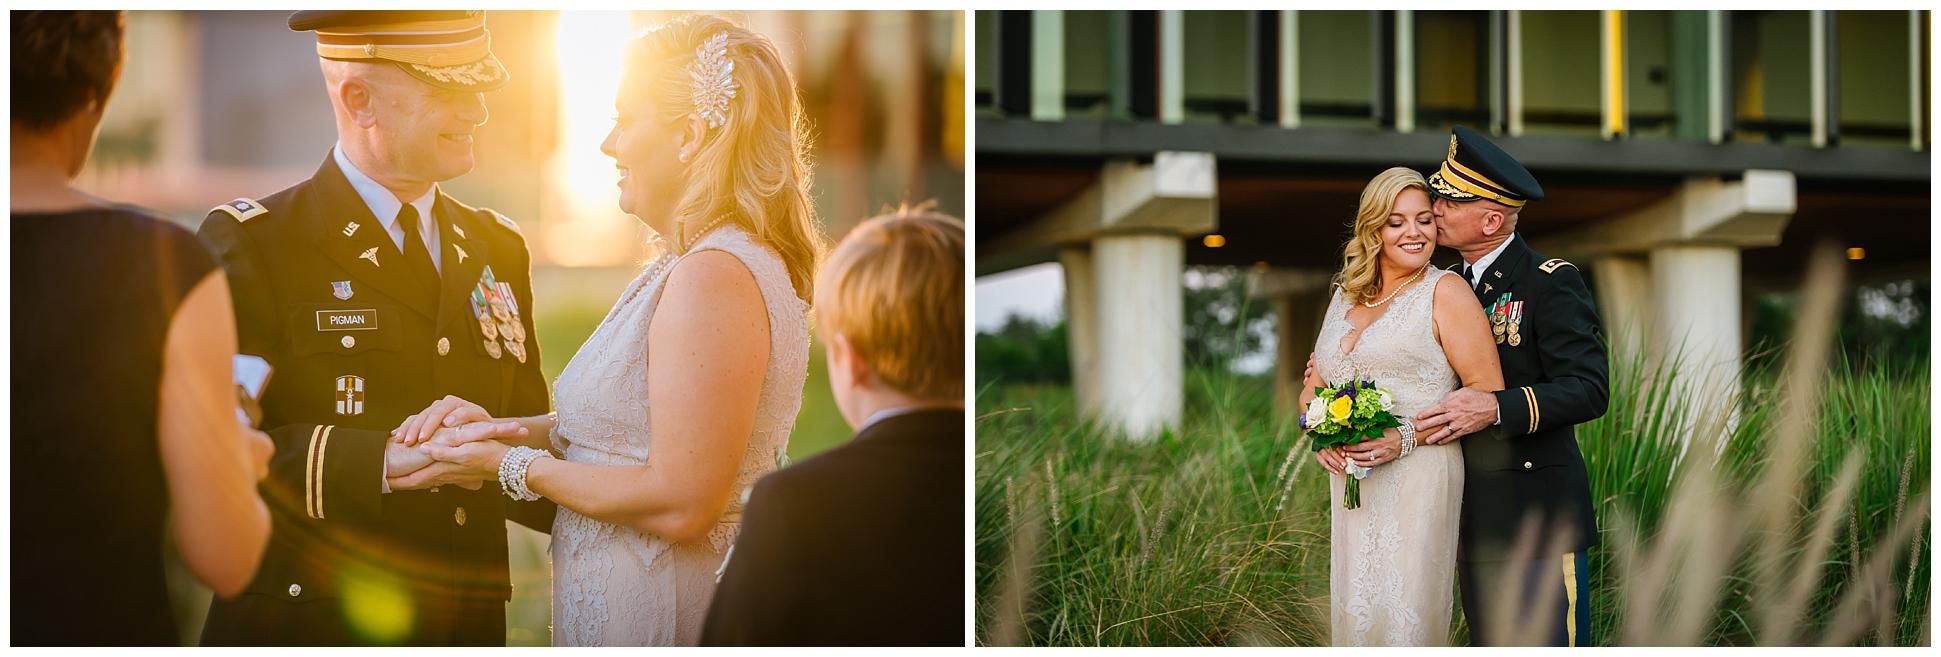 Ashlee-hamon-photography-year-in-review-2016-travel-wanderlust-vsco-adventure-wedding_0091.jpg